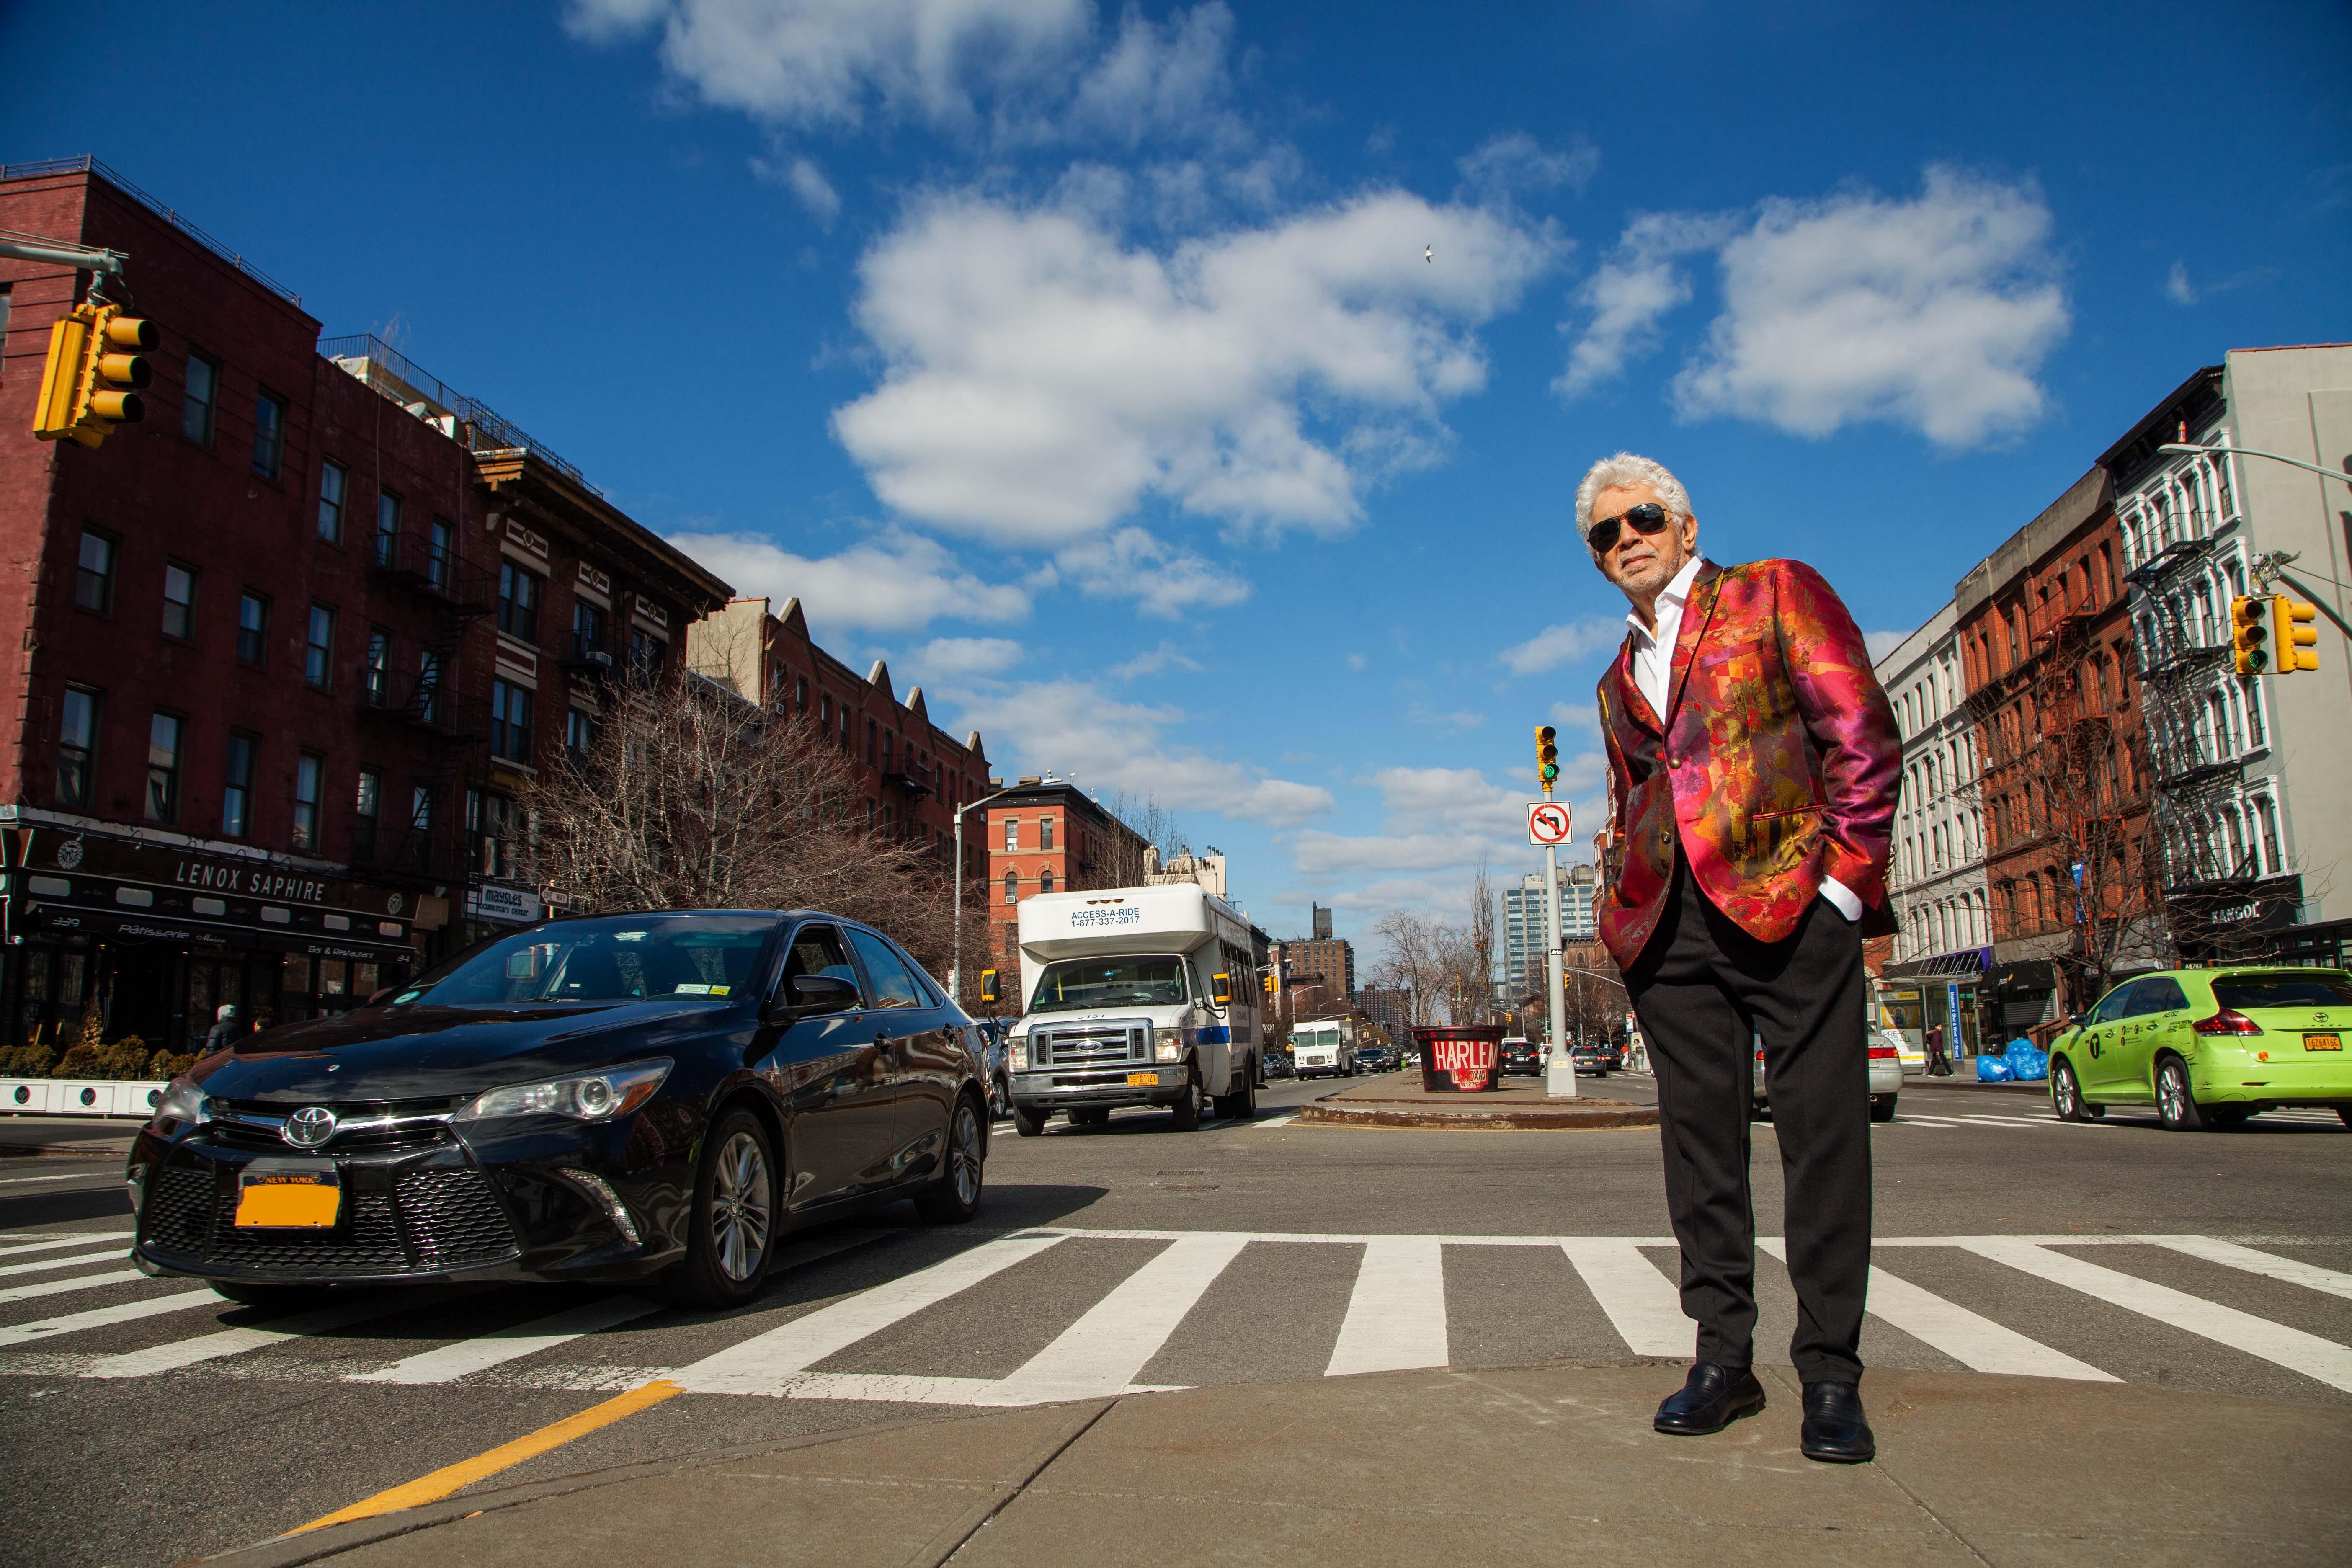 Pianist Monty Alexander brings Caribbean flavor to the Elkhart Jazz Festival